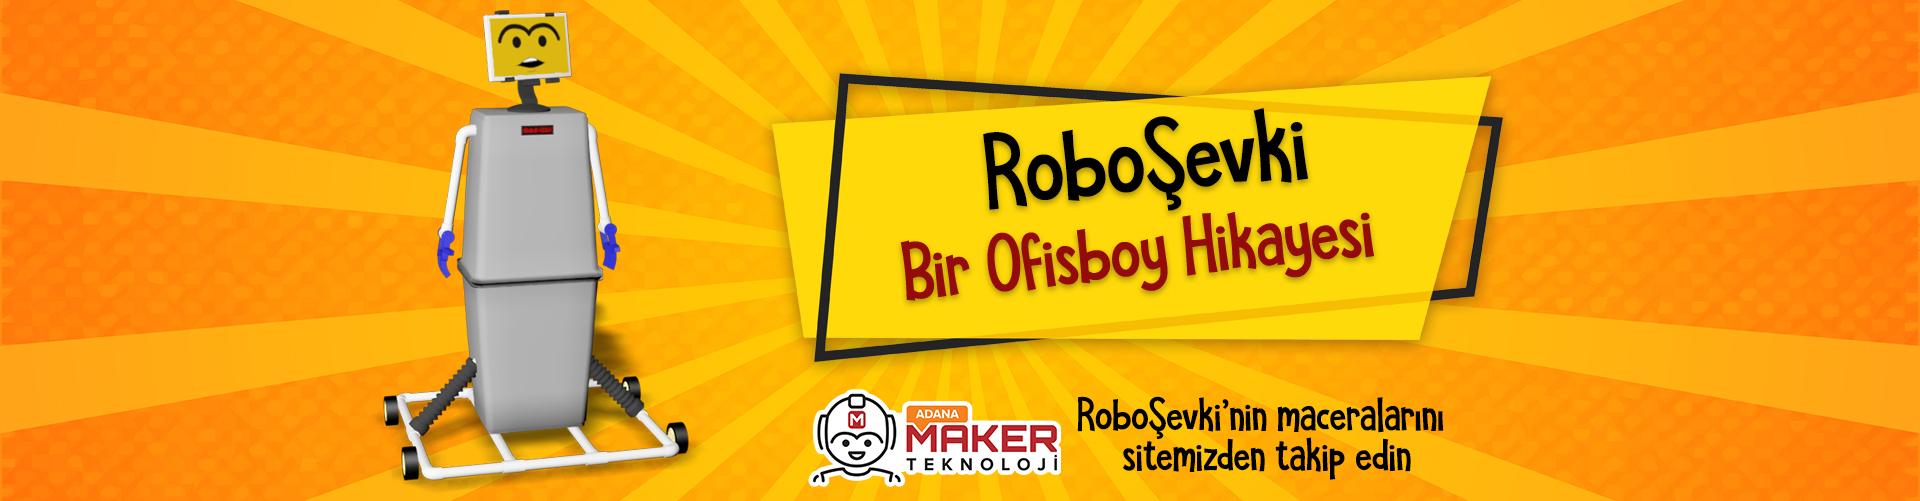 Adana Maker Teknoloji Fuarı